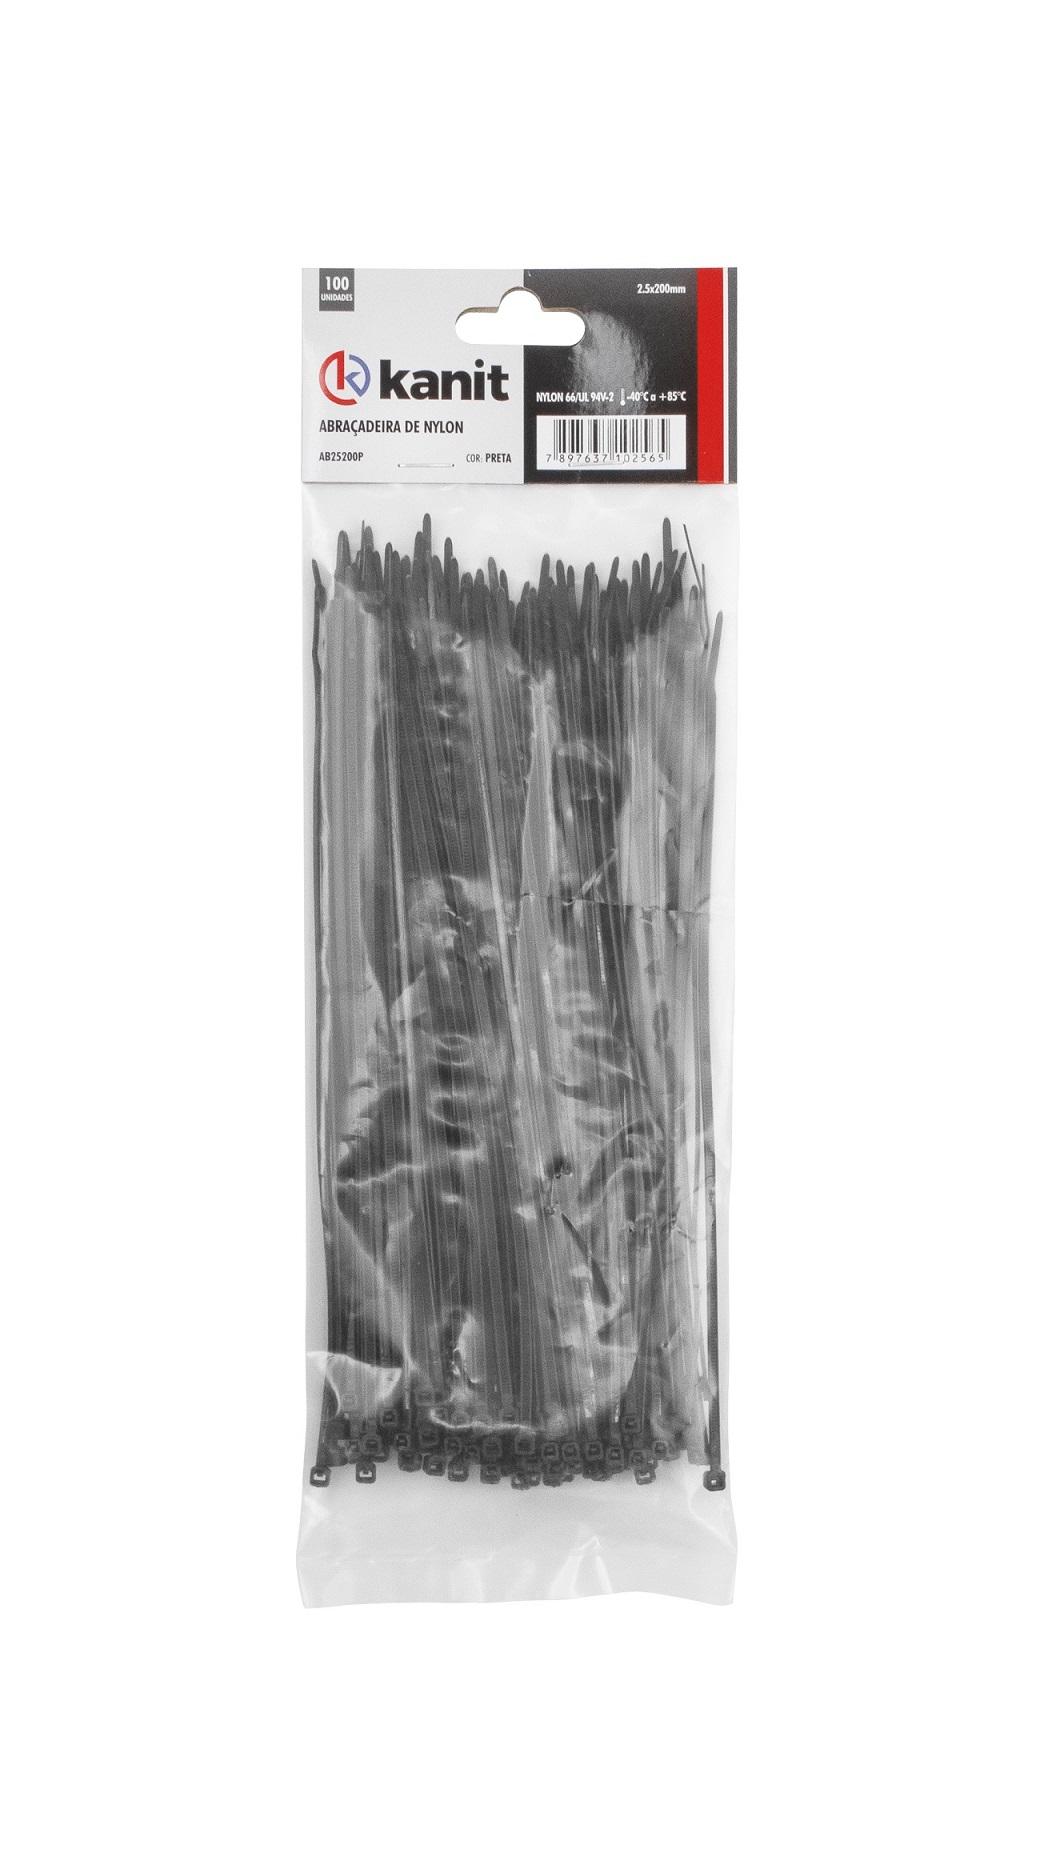 Fitas abraçadeiras (Nylon) 50 mm (12500 Unidades)